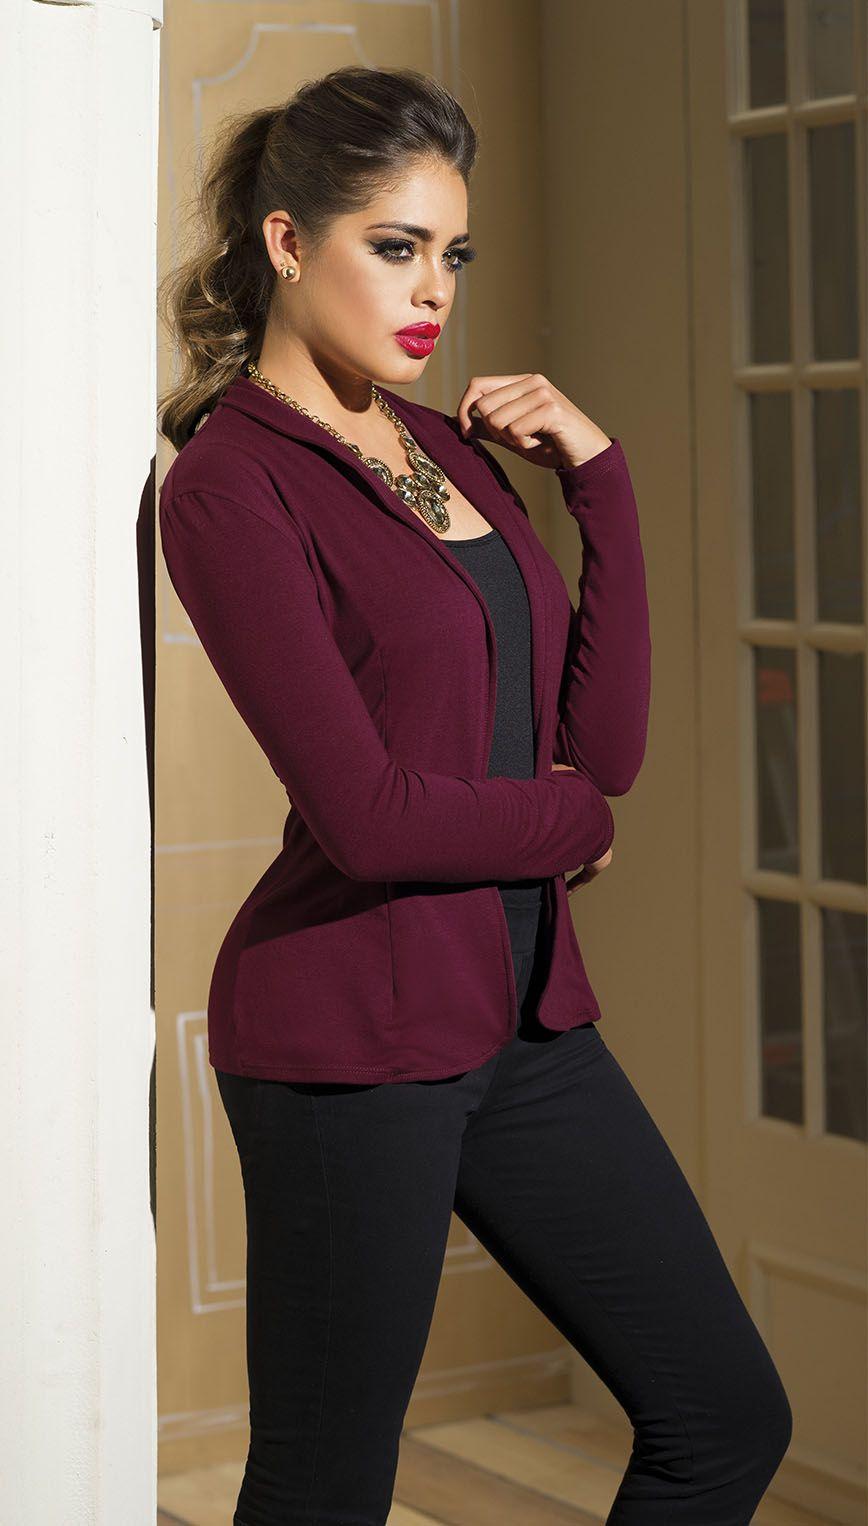 #Blazer #Carmel #ModaSexy